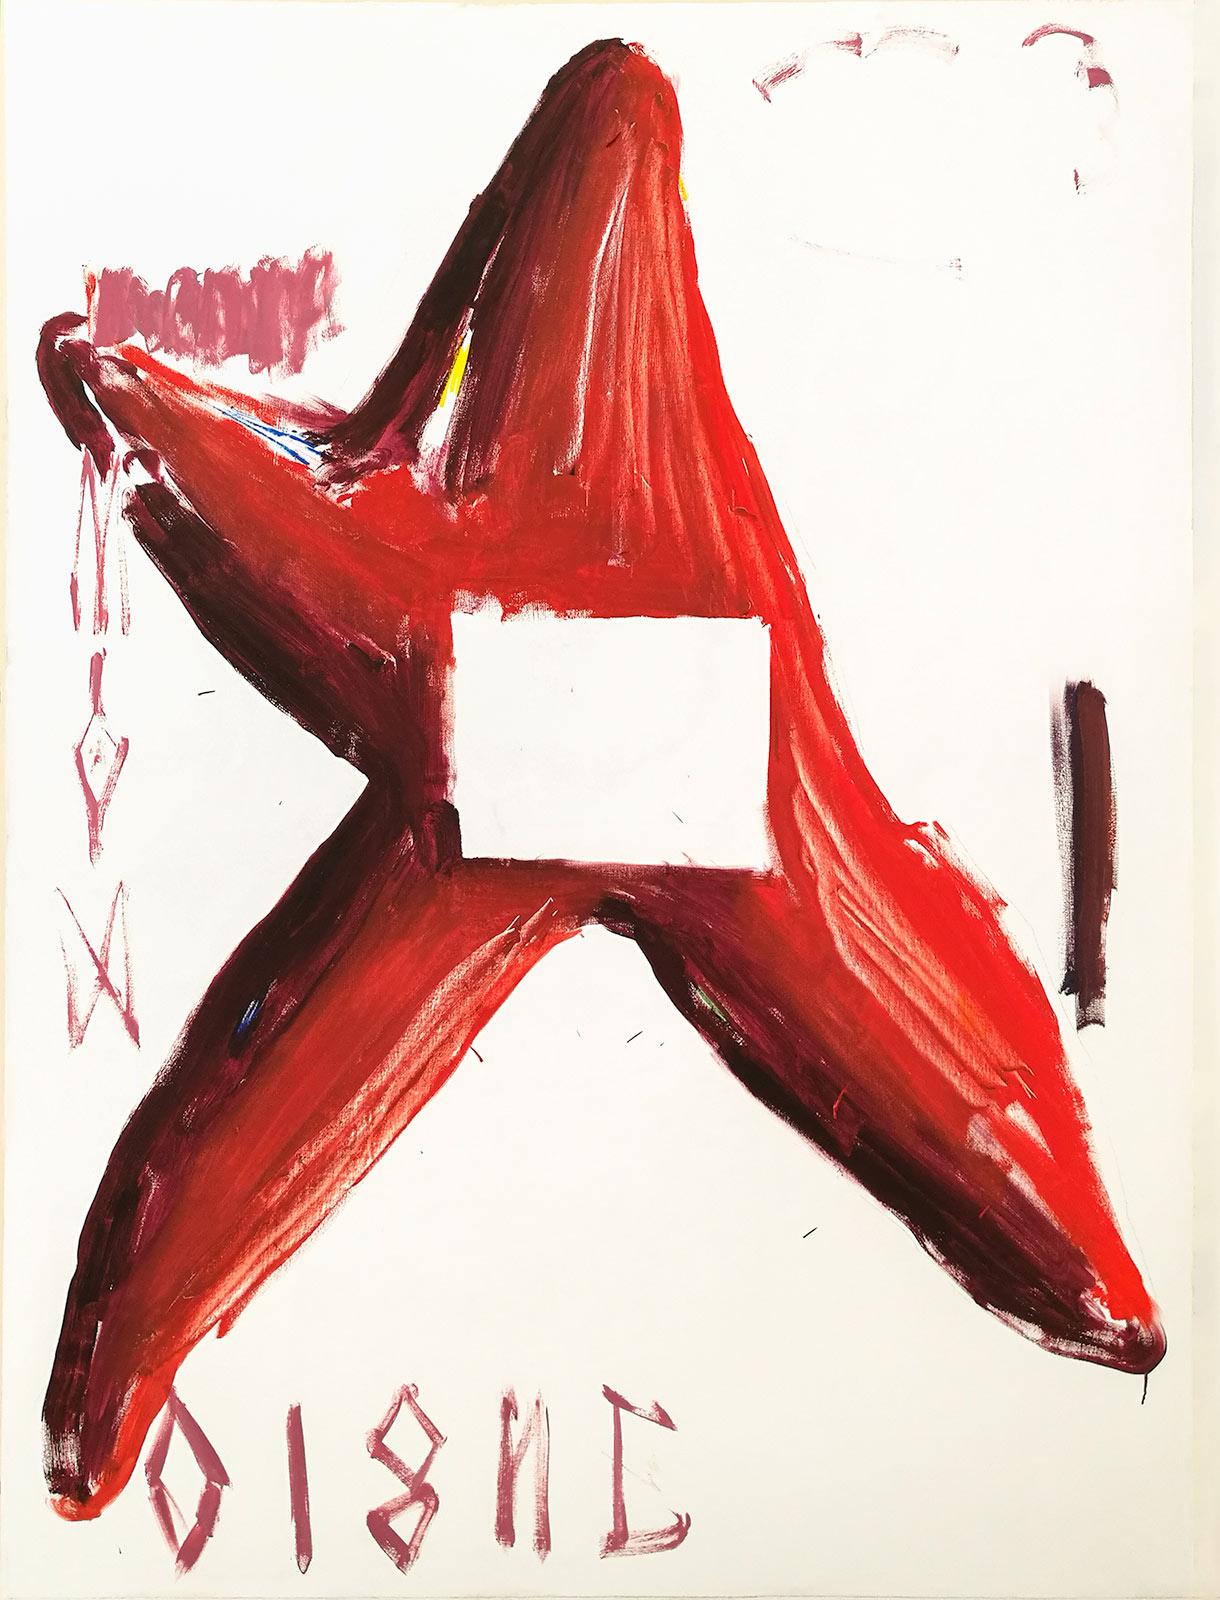 carlos-pesudo-berlin-2021-oil-on-canvas-185x150cm